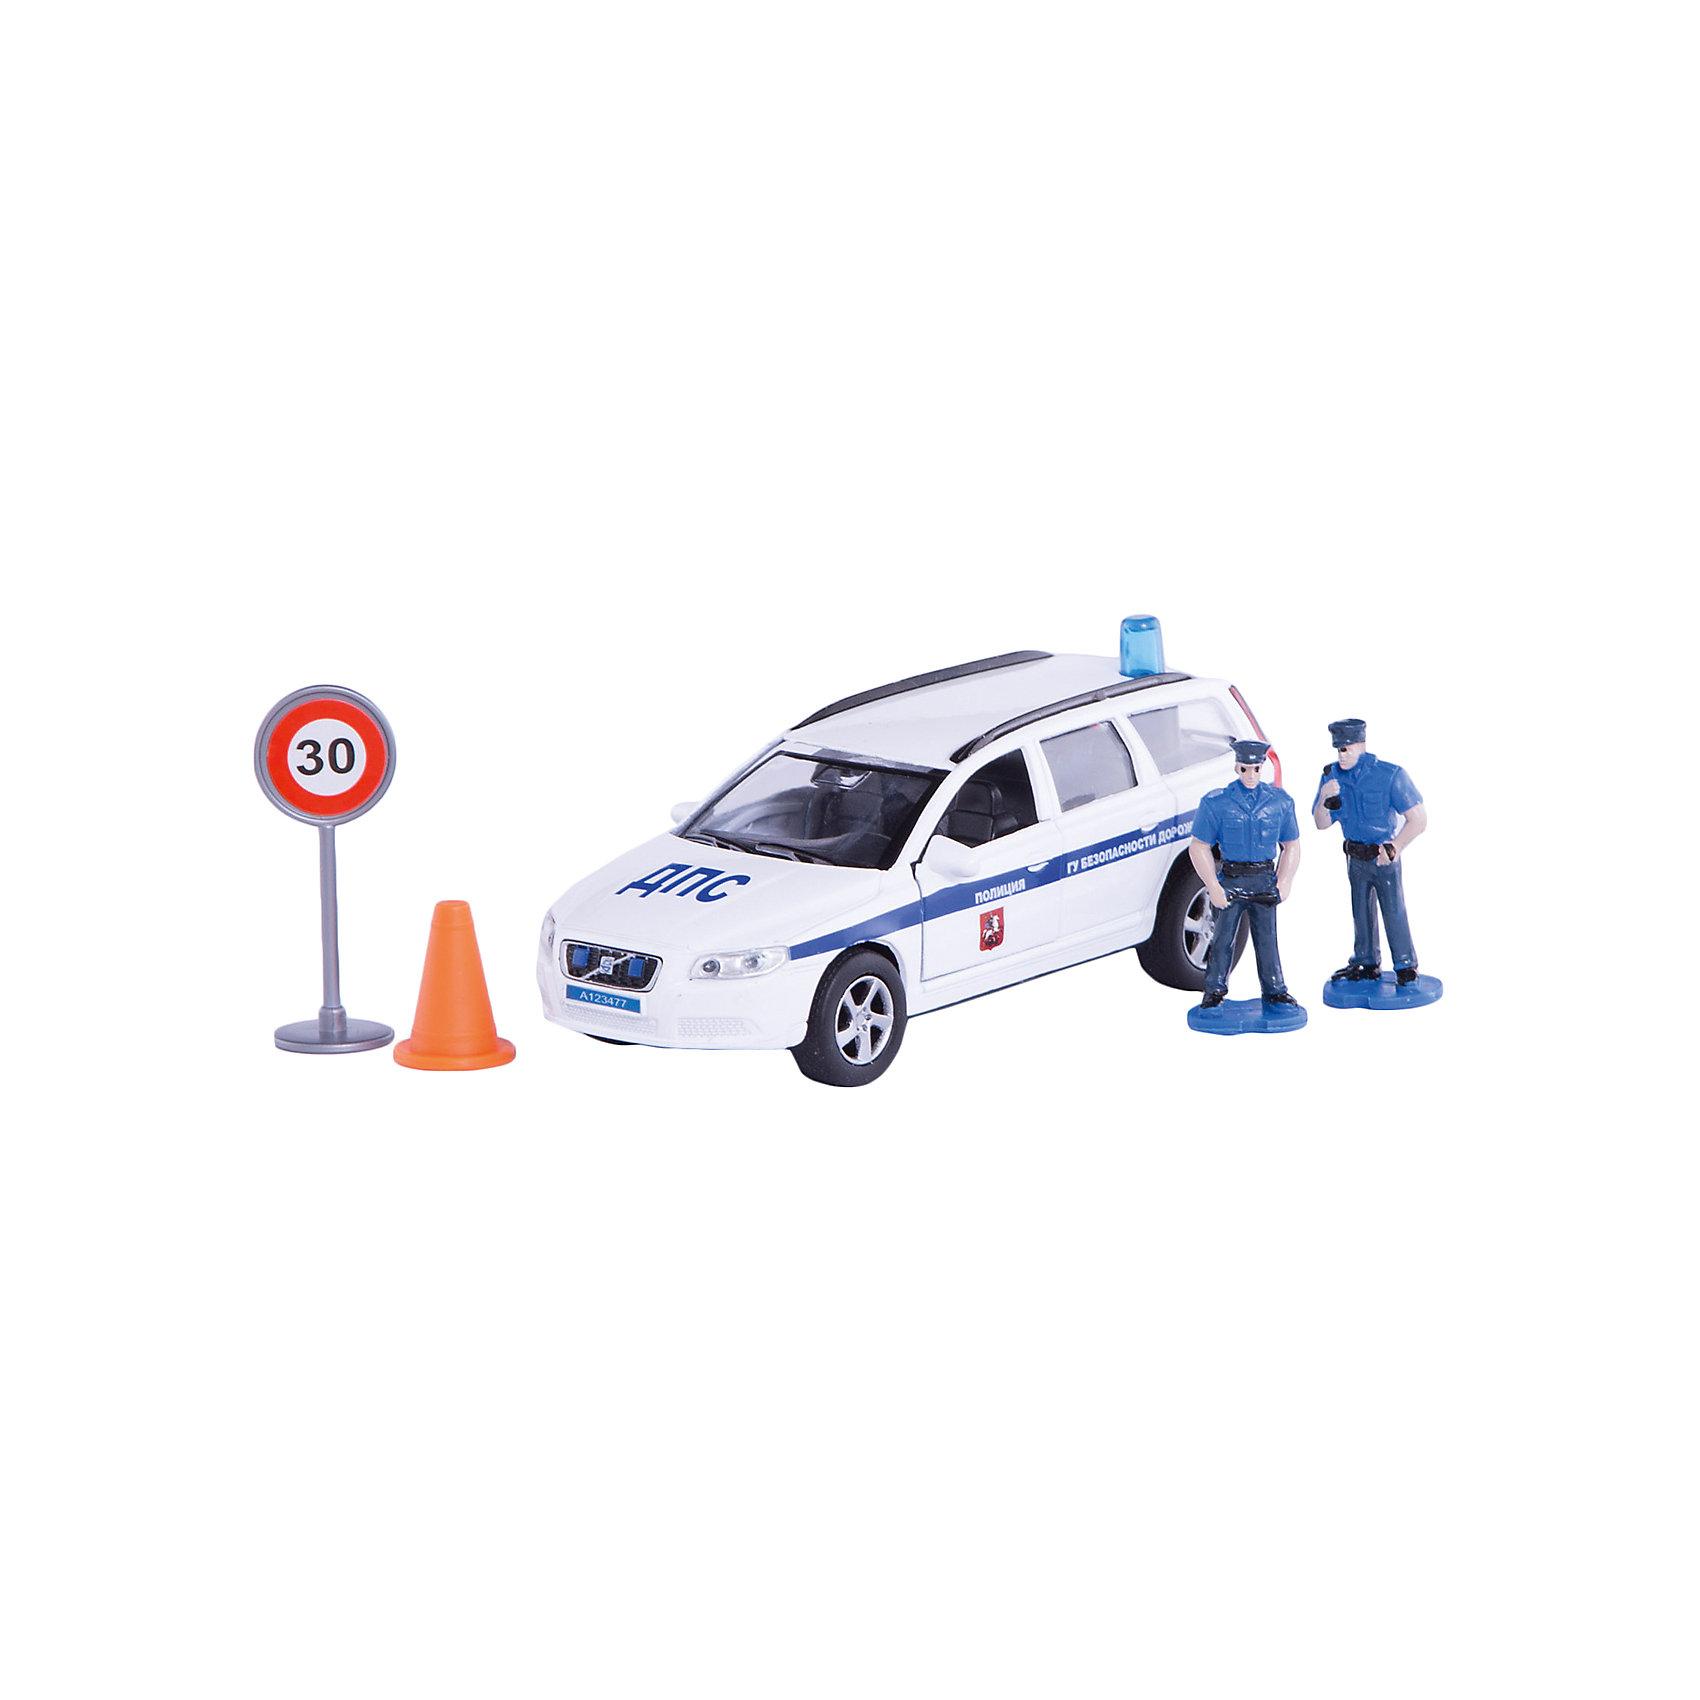 Пламенный мотор Машина Volvo Полиция ДПС ГУ БДД, 1:32, со светом и звуком, Пламенный мотор пламенный мотор машина volvo аварийная служба горгаз 1 32 со светом и звуком пламенный мотор